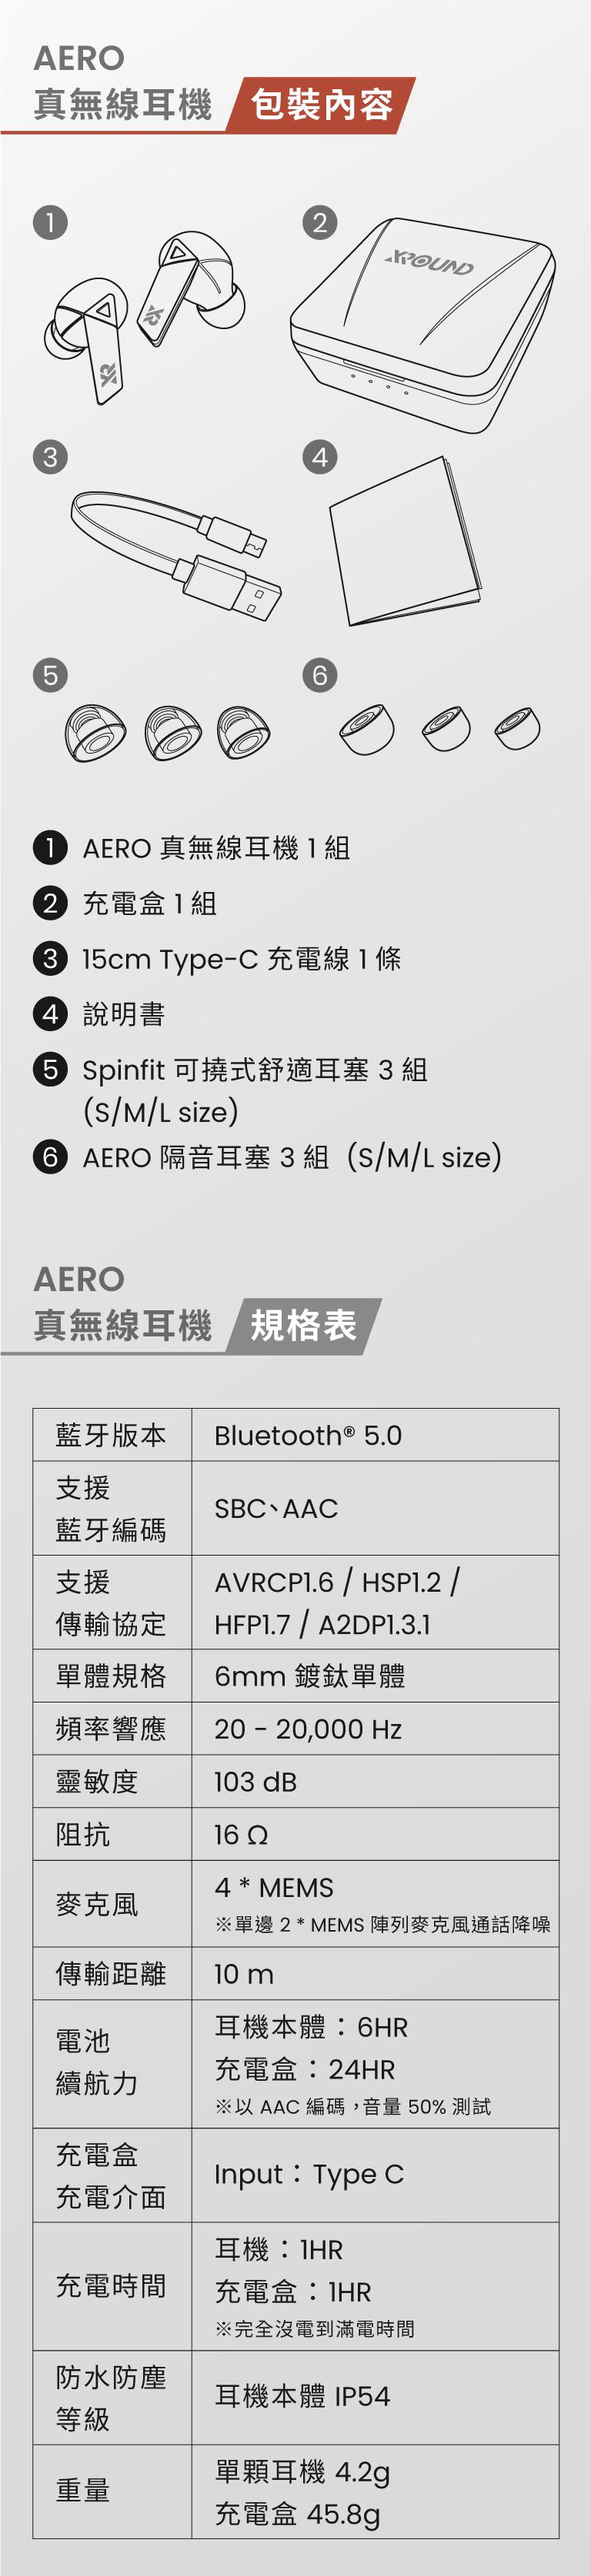 AERO16